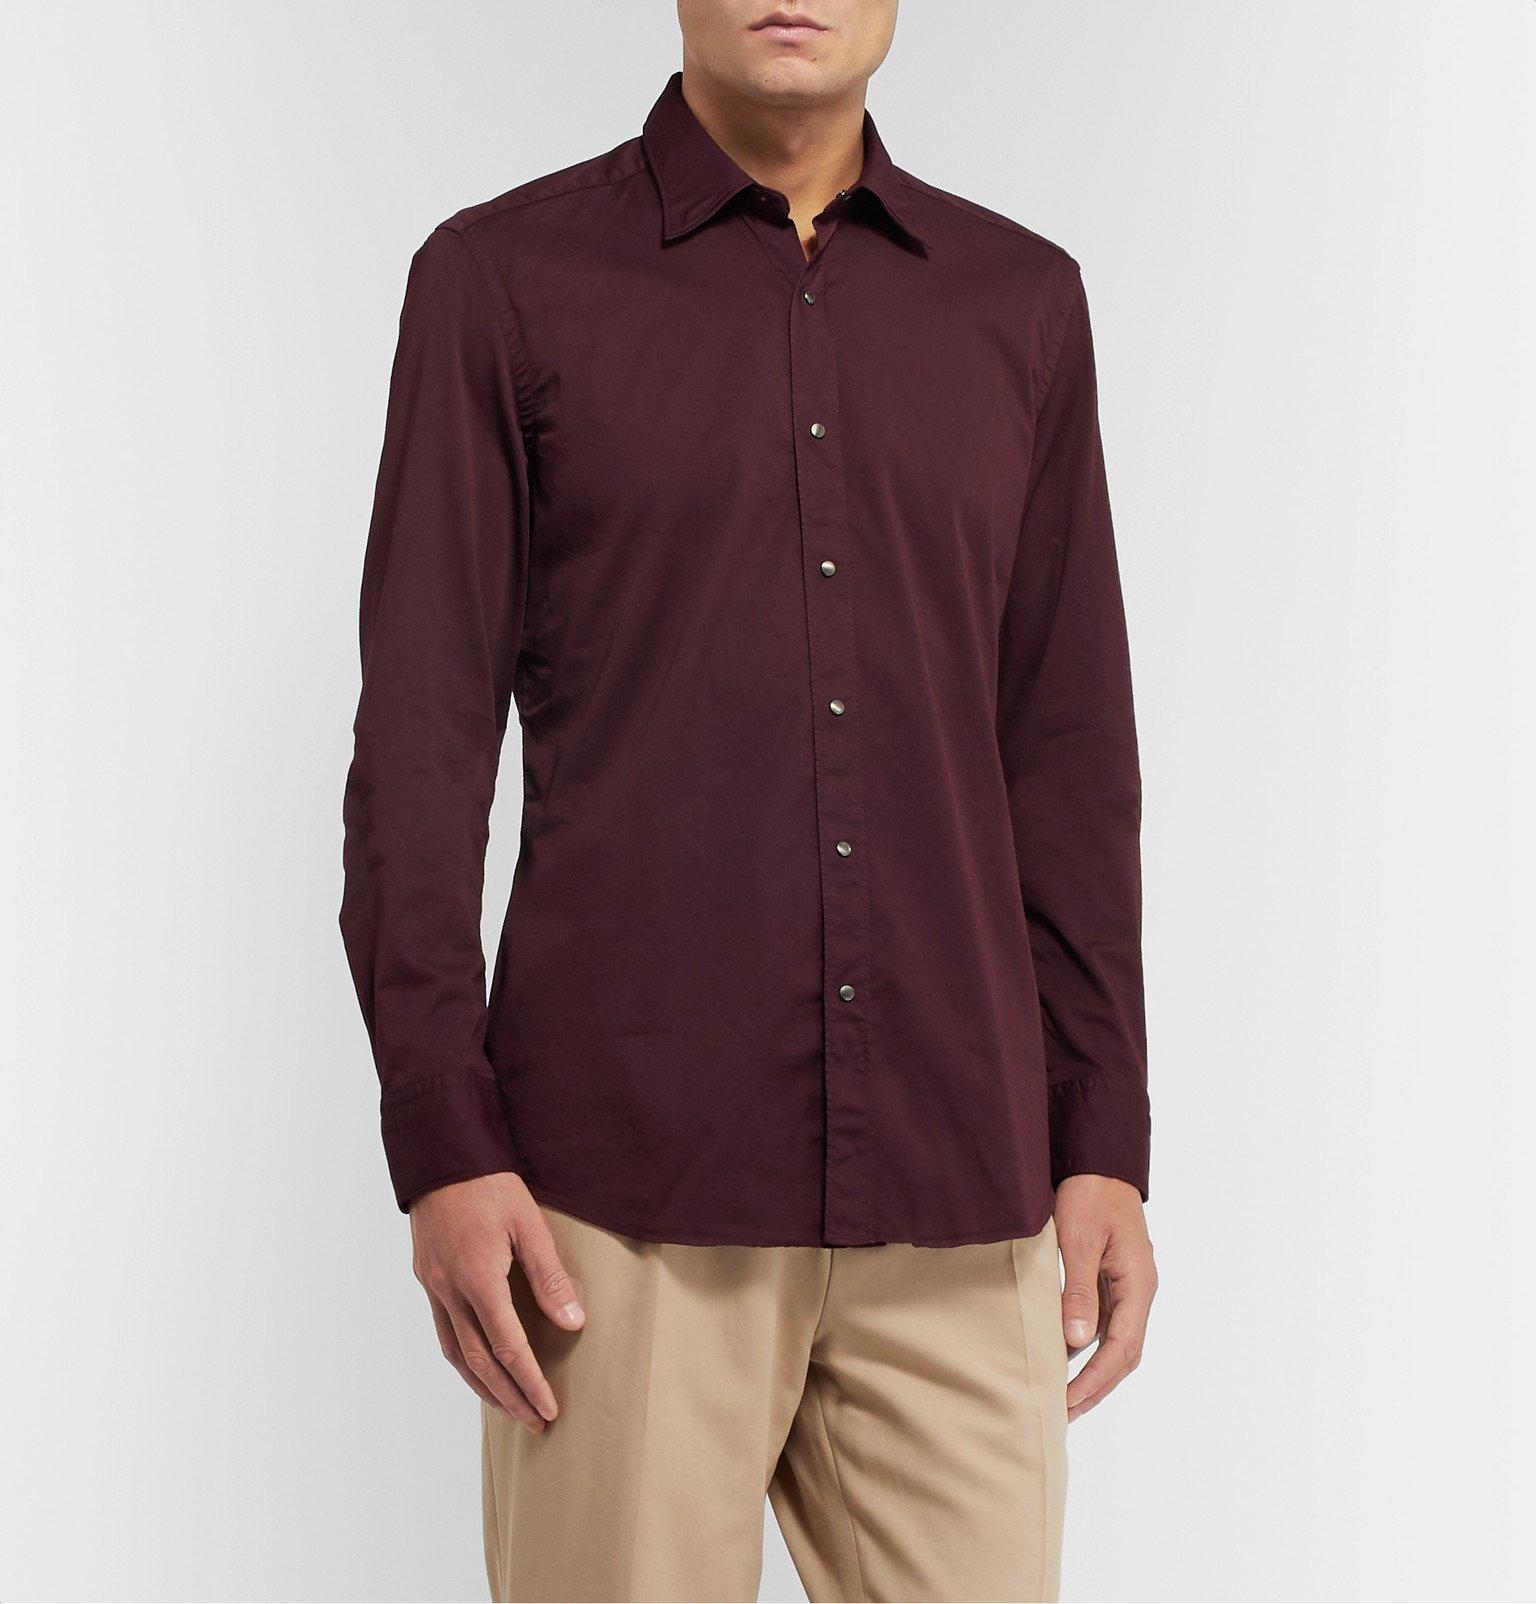 Tod's - Slim-Fit Garment-Dyed Cotton-Blend Twill Shirt - Burgundy